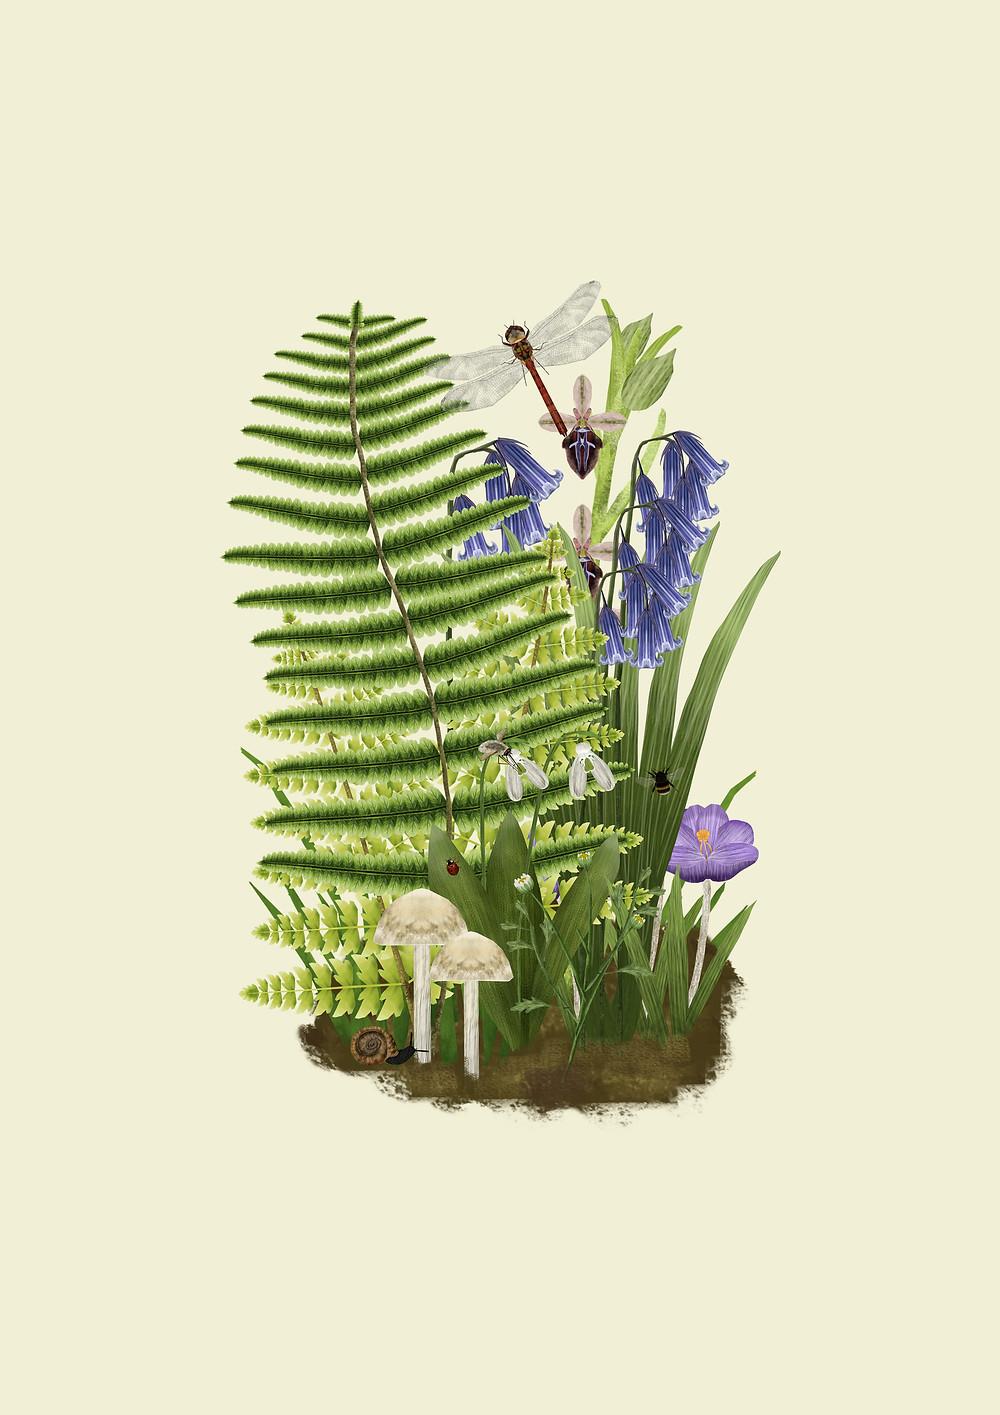 Fern illustration wildflower mushroom art by Rhian Davie